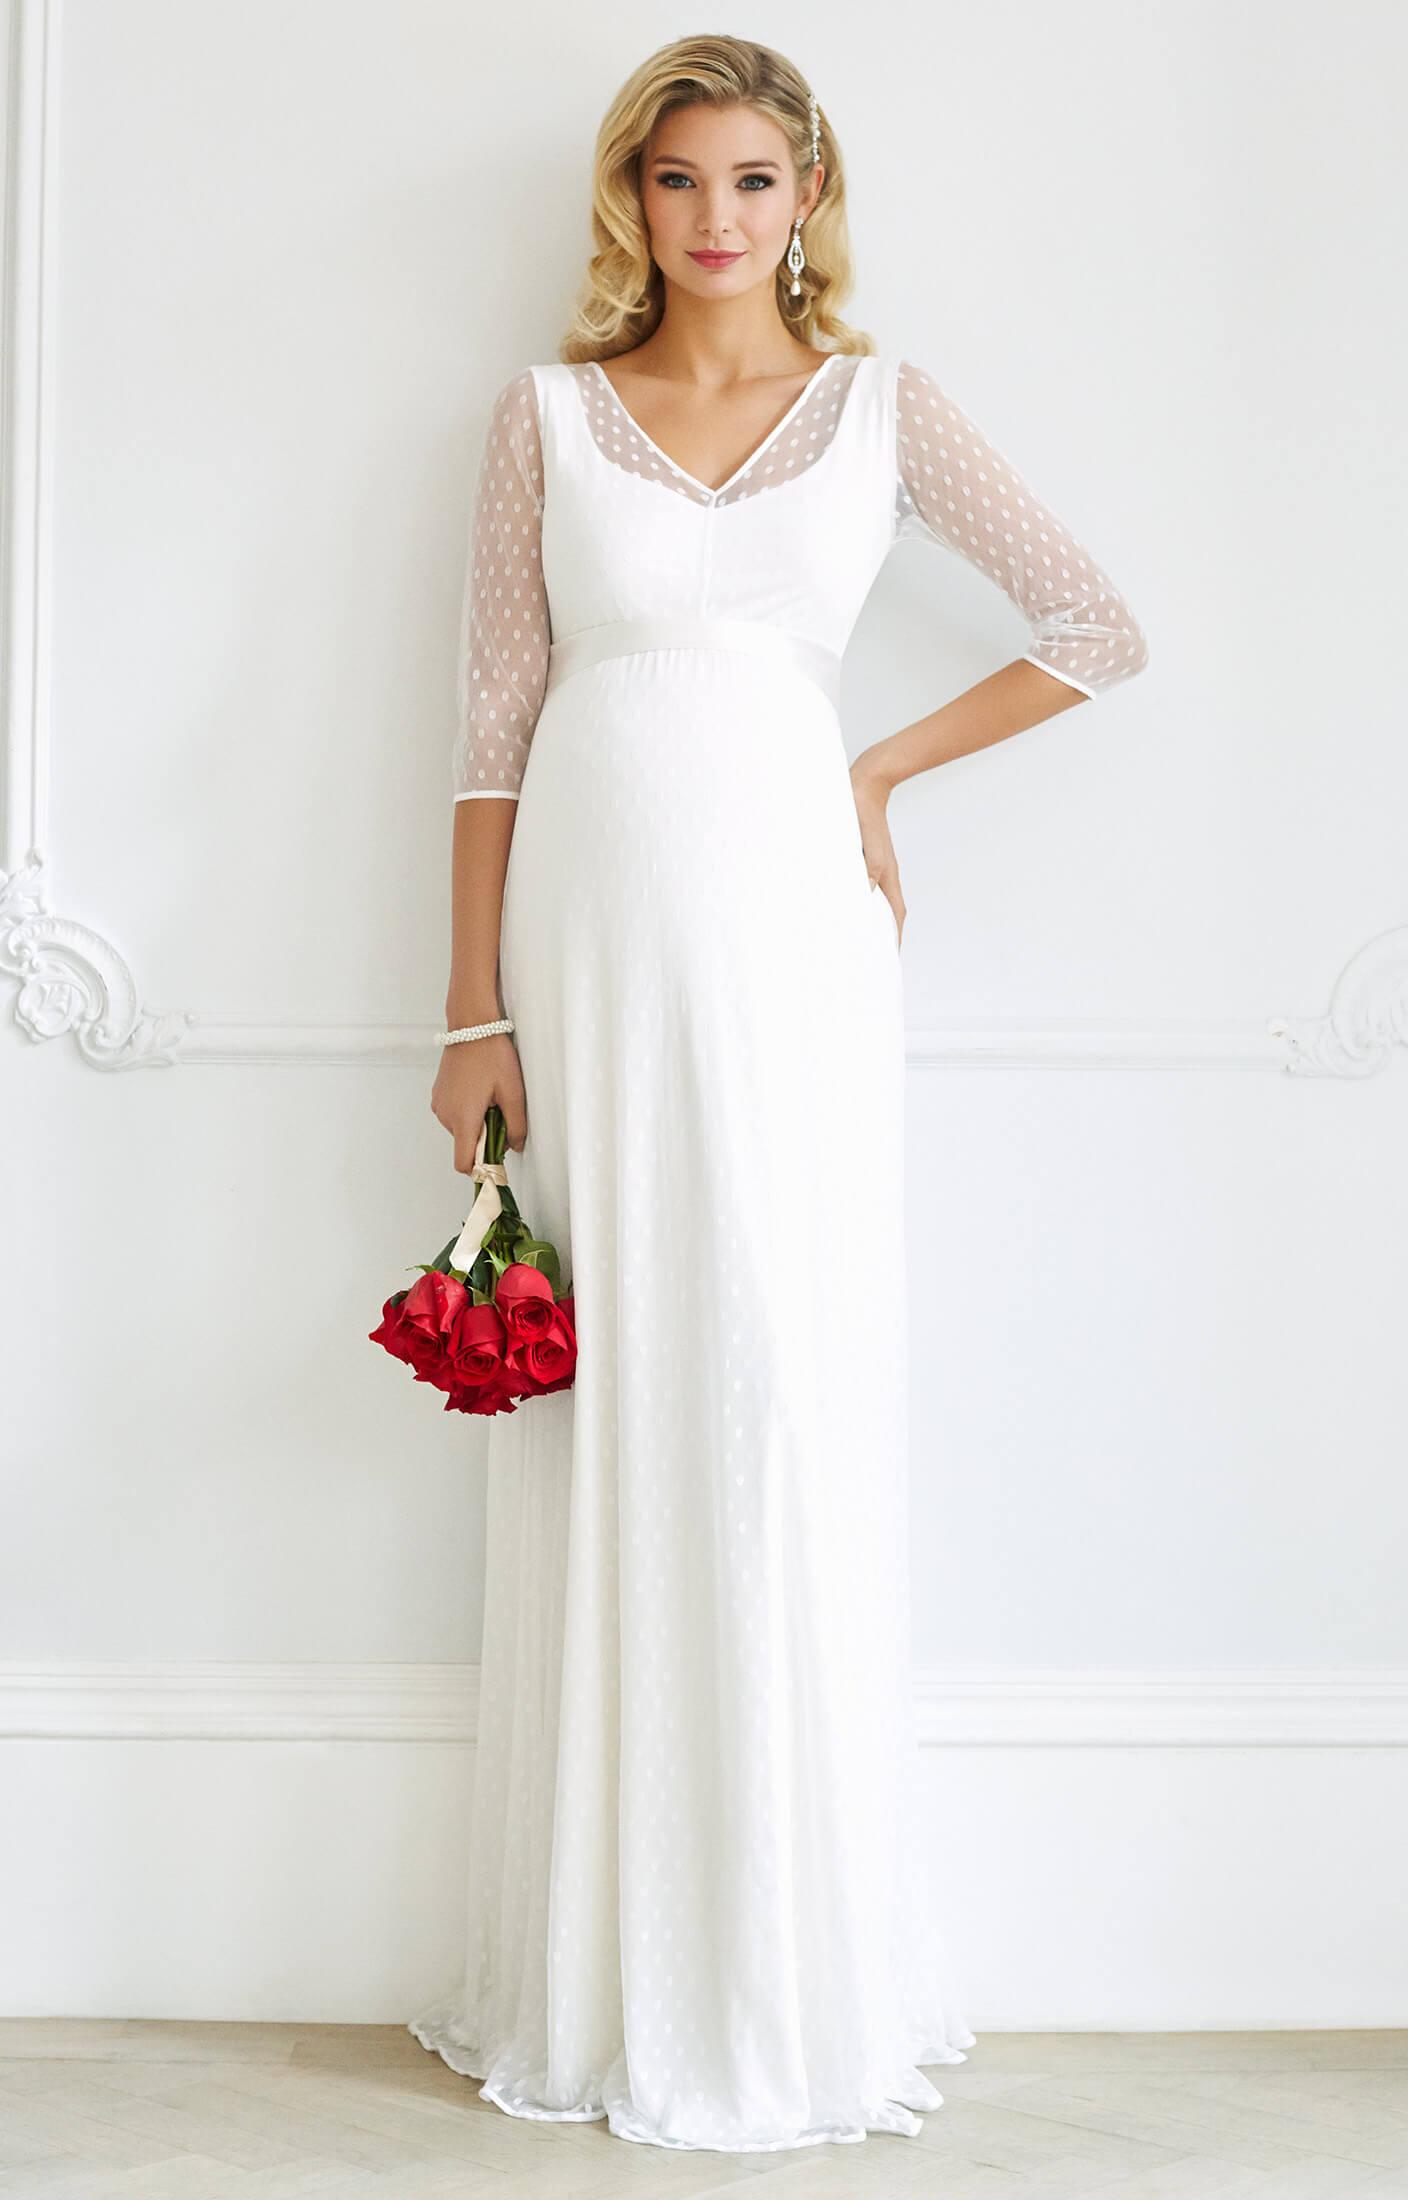 Silvia maternity wedding gown ivory maternity wedding for Ivory maternity wedding dresses